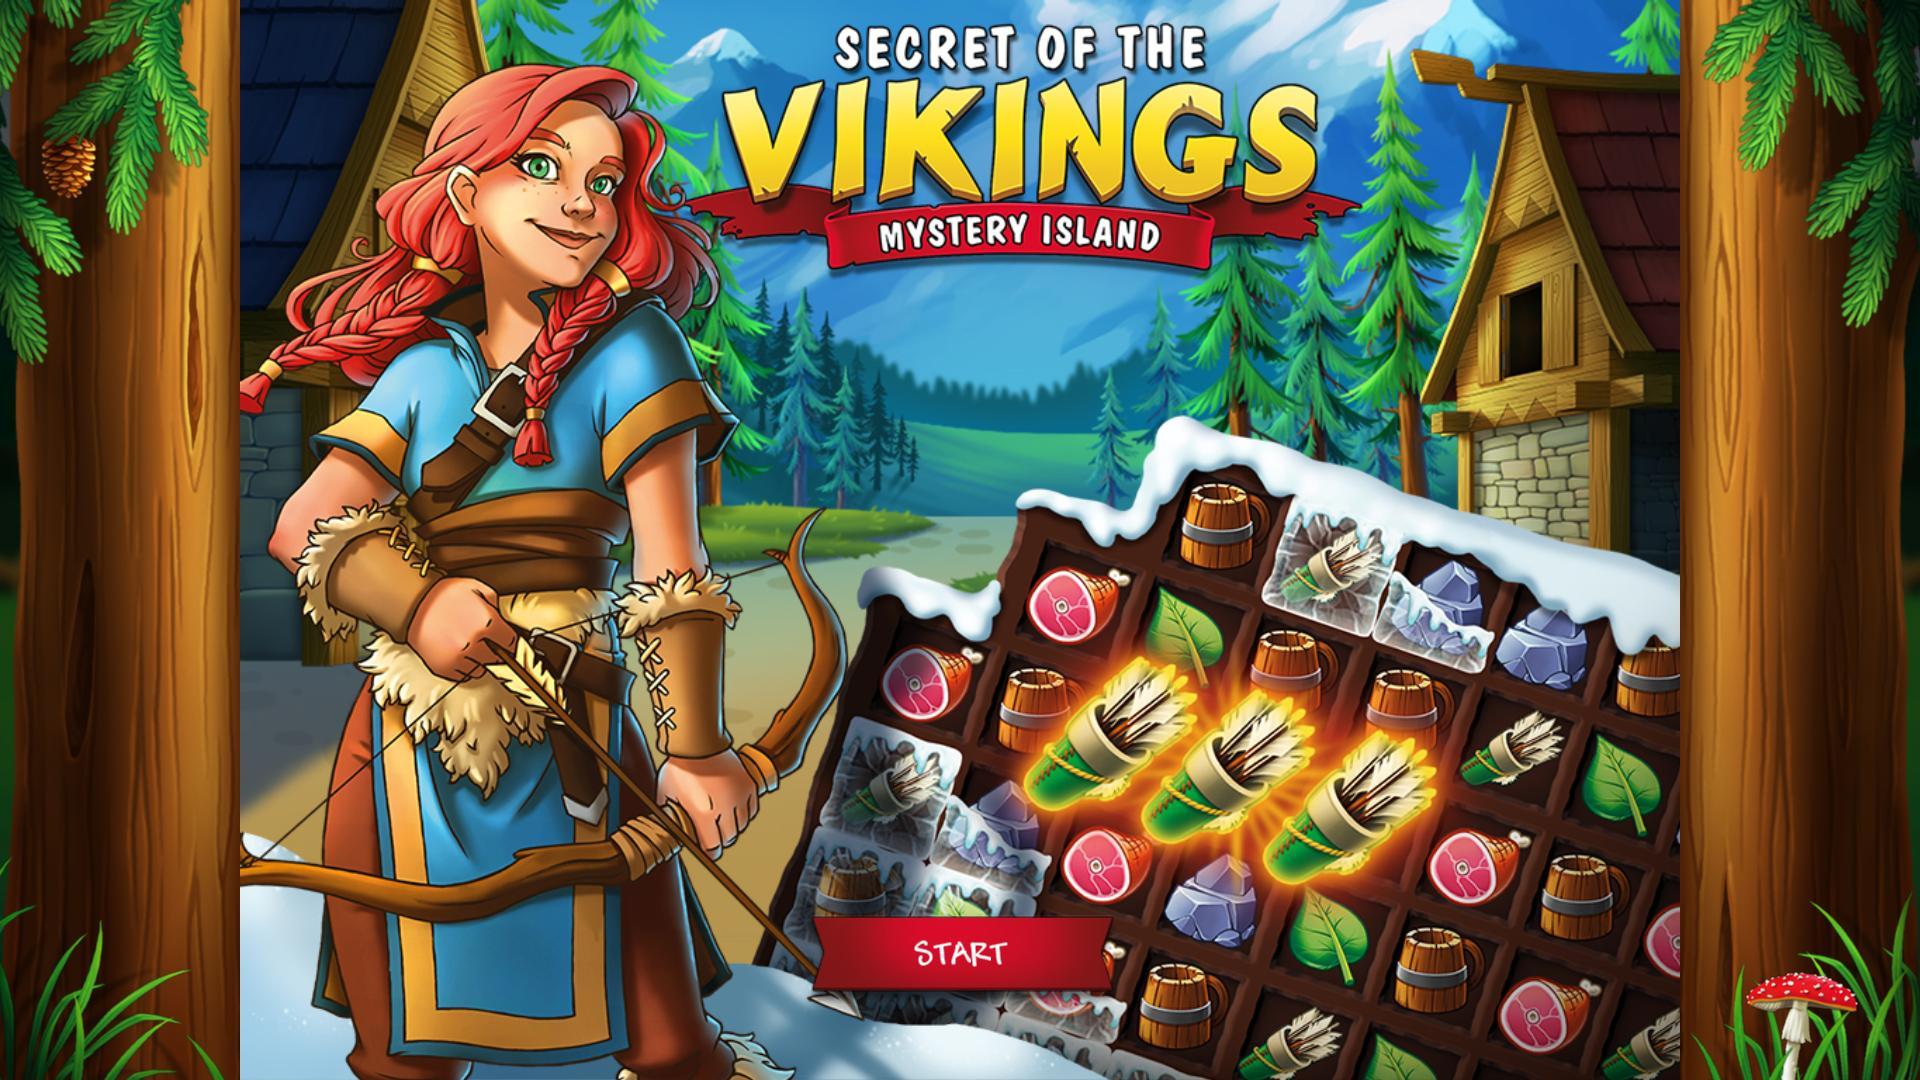 Секреты викингов: Тайна острова | Secrets of the Vikings: Mystery Island (En)